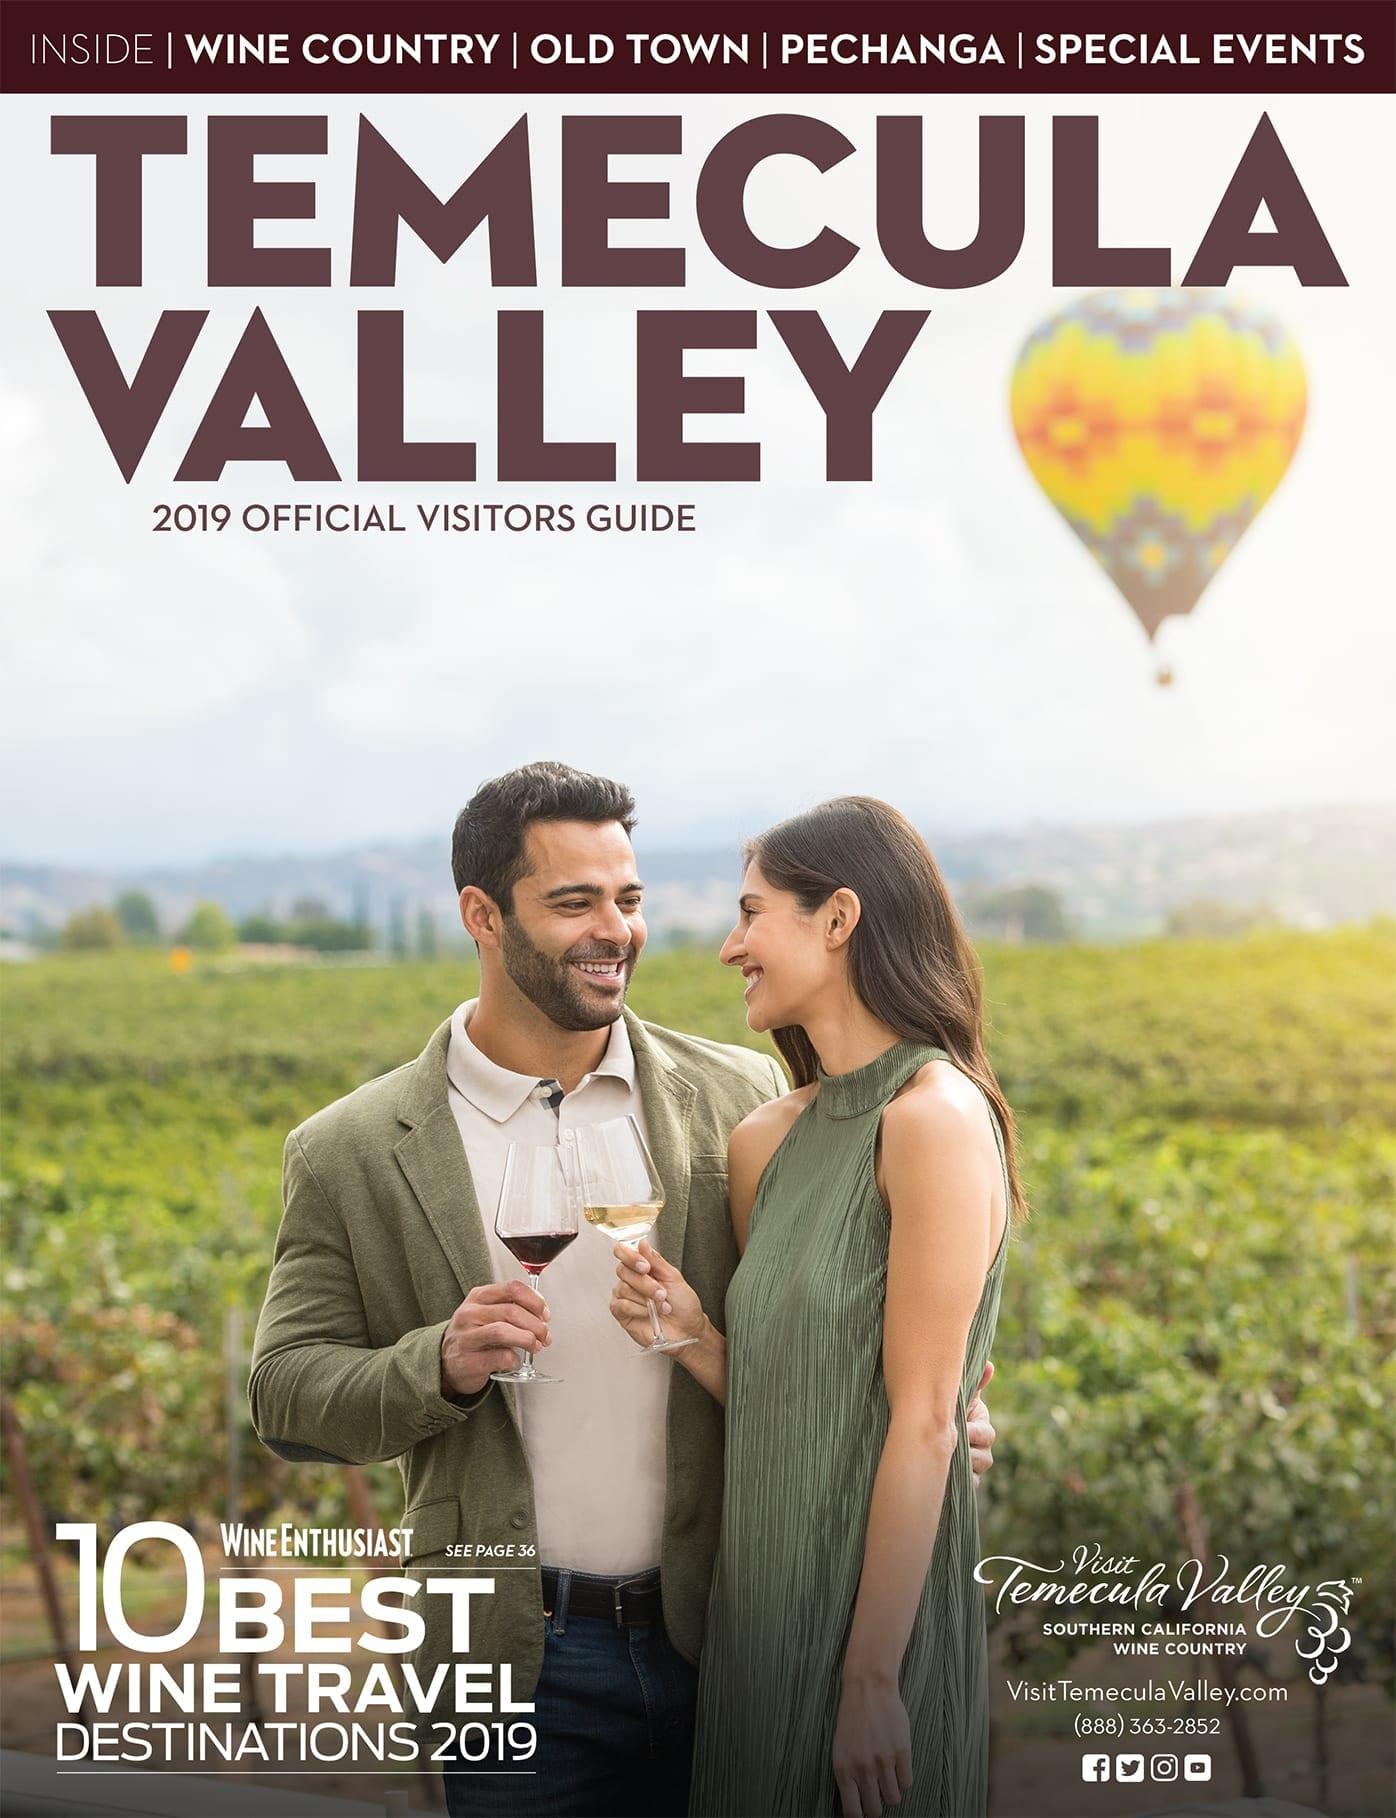 Visit Temecula Valley | Chamber Marketing Partners